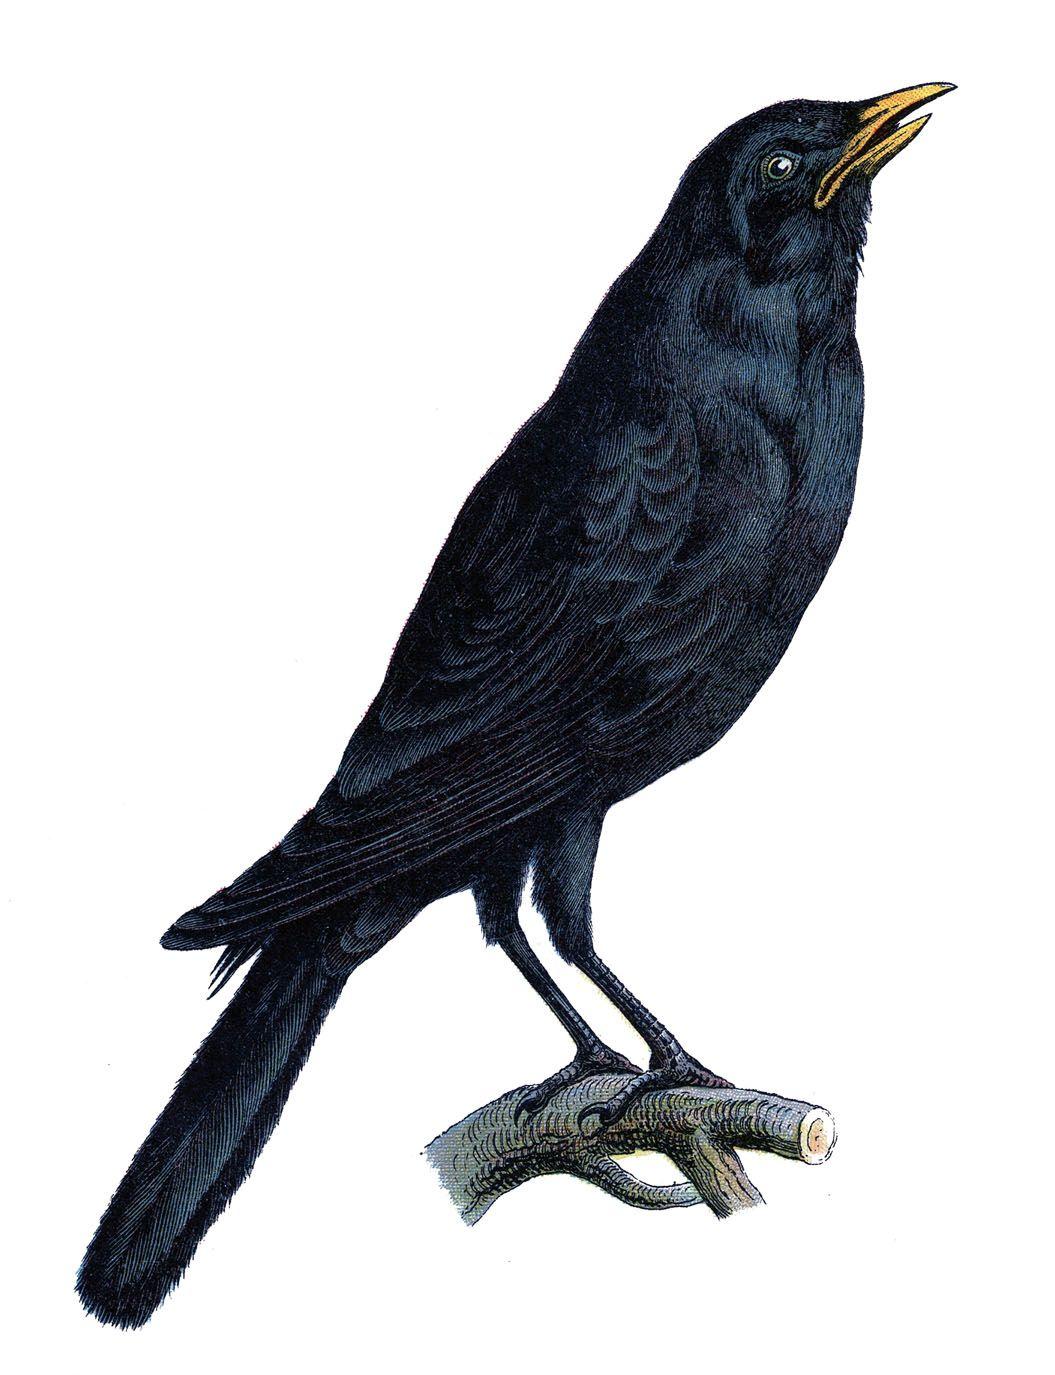 Vintage Halloween Clip Art | Vintage Image - Old Crow - Halloween - The Graphics Fairy